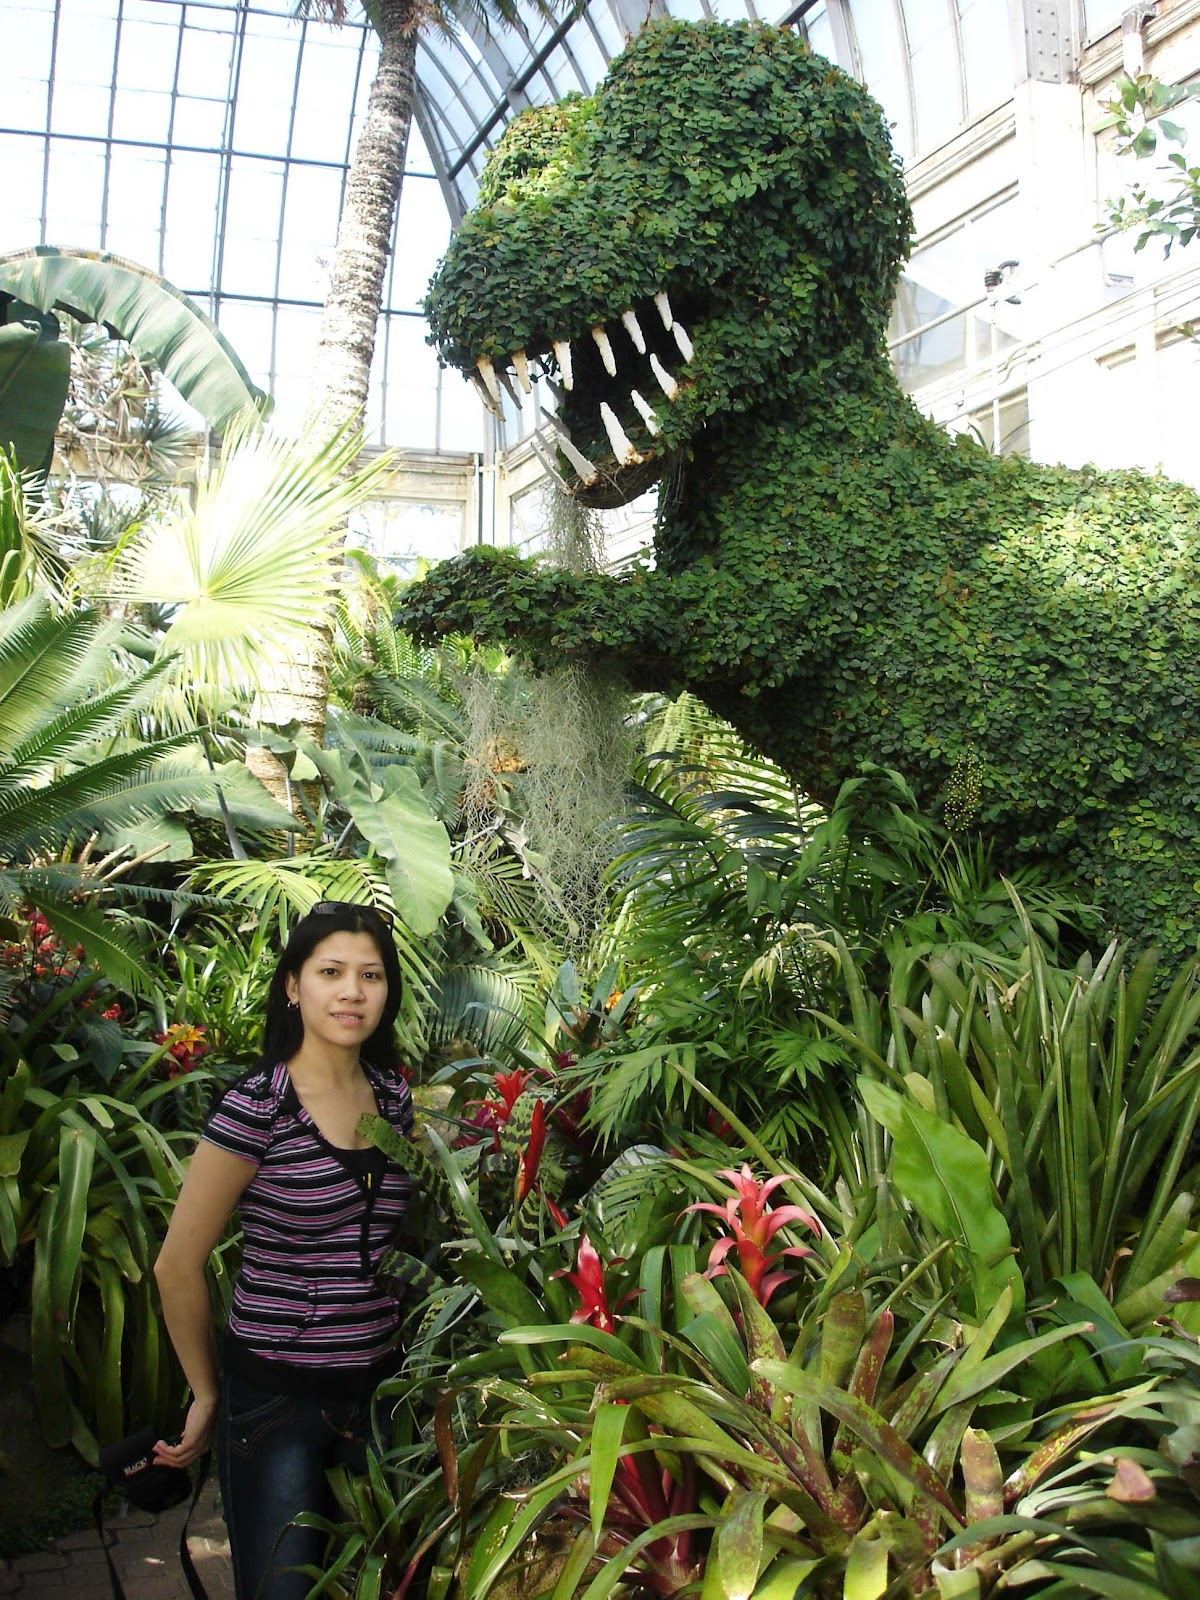 Visit Botanical Gardens Buffalo   Travel Quest - US Road ...